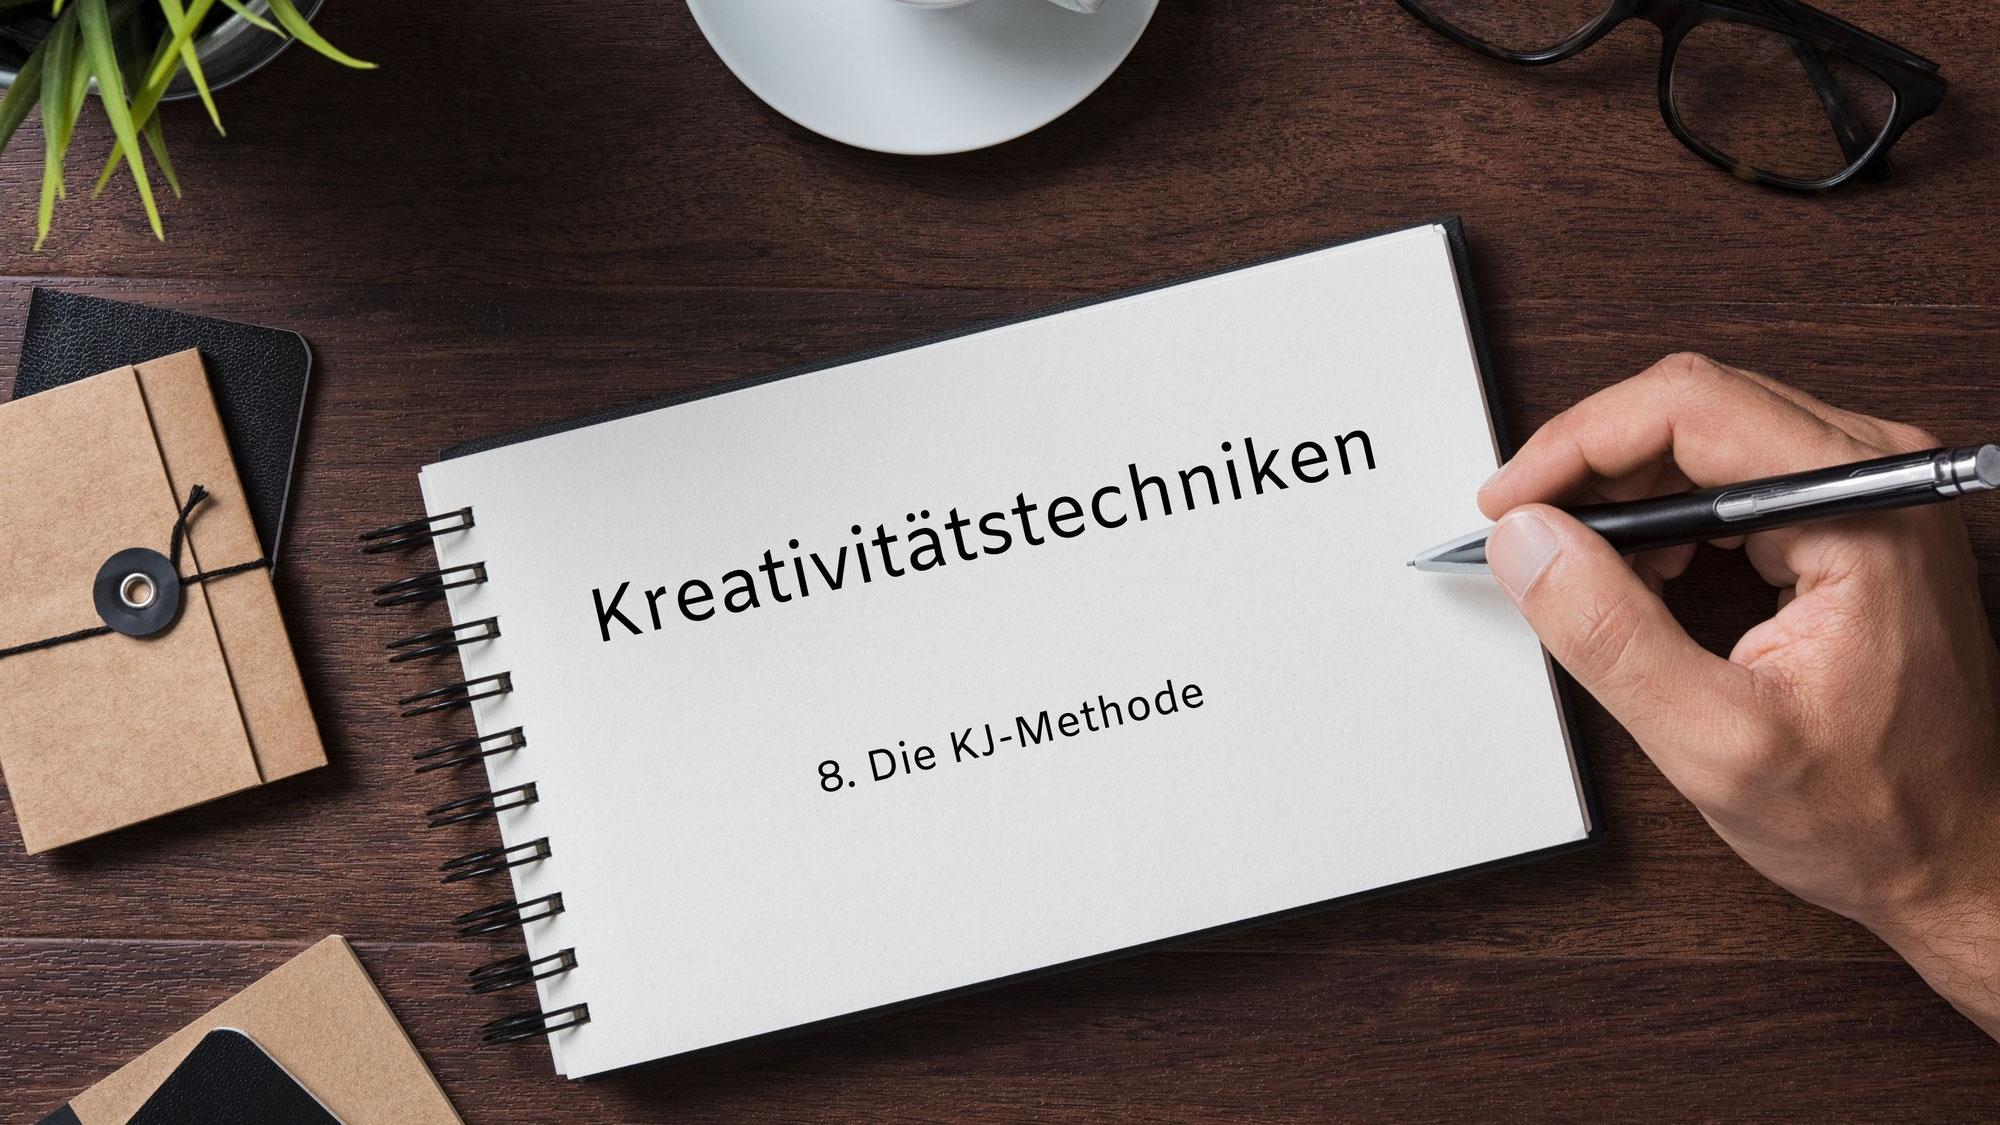 Kreativitätstechniken 8. Die KJ-Methode